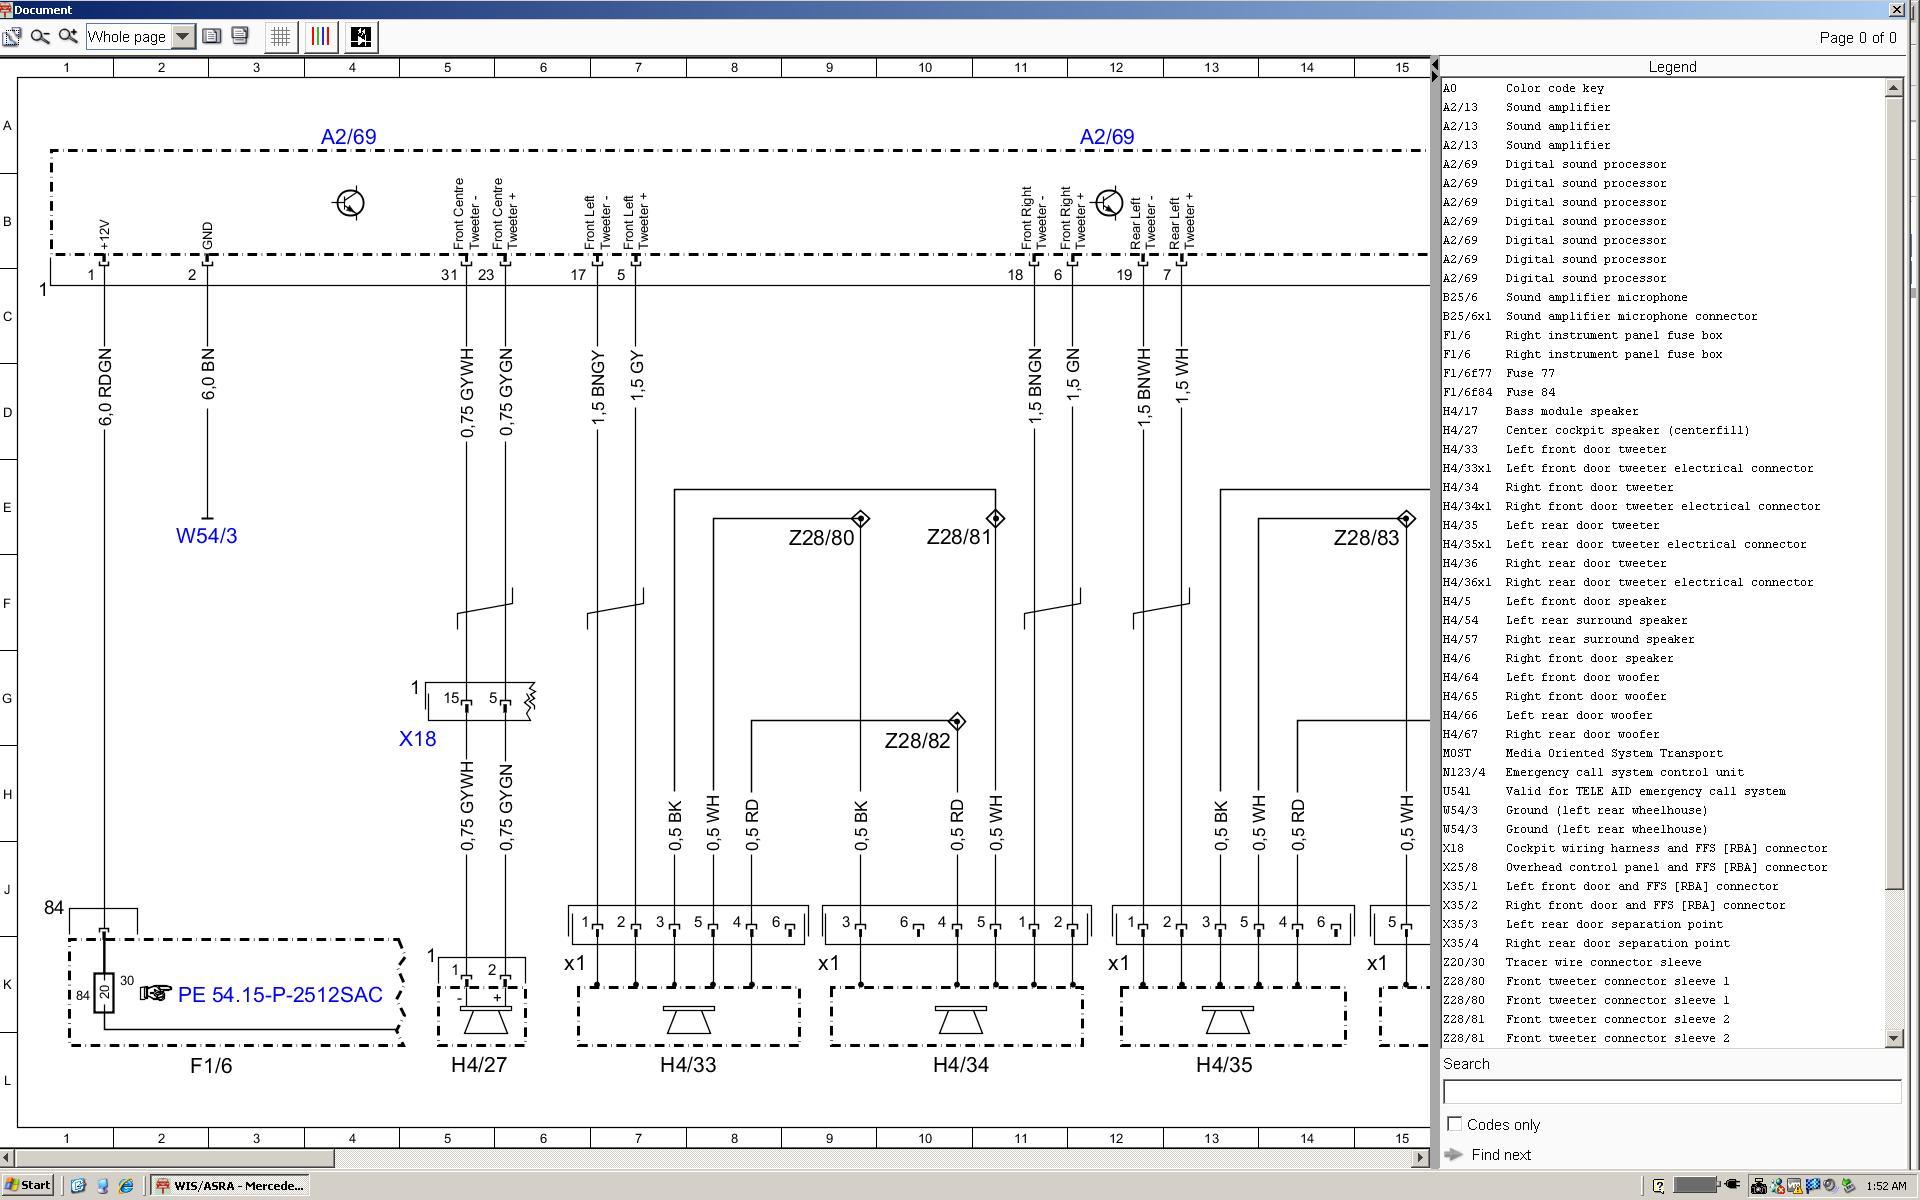 Brilliant Mercedes Benz 2010 C300 Fuse Diagram On Mercedes E200 Wiring Diagram Wiring Database Mangnorabwedabyuccorg